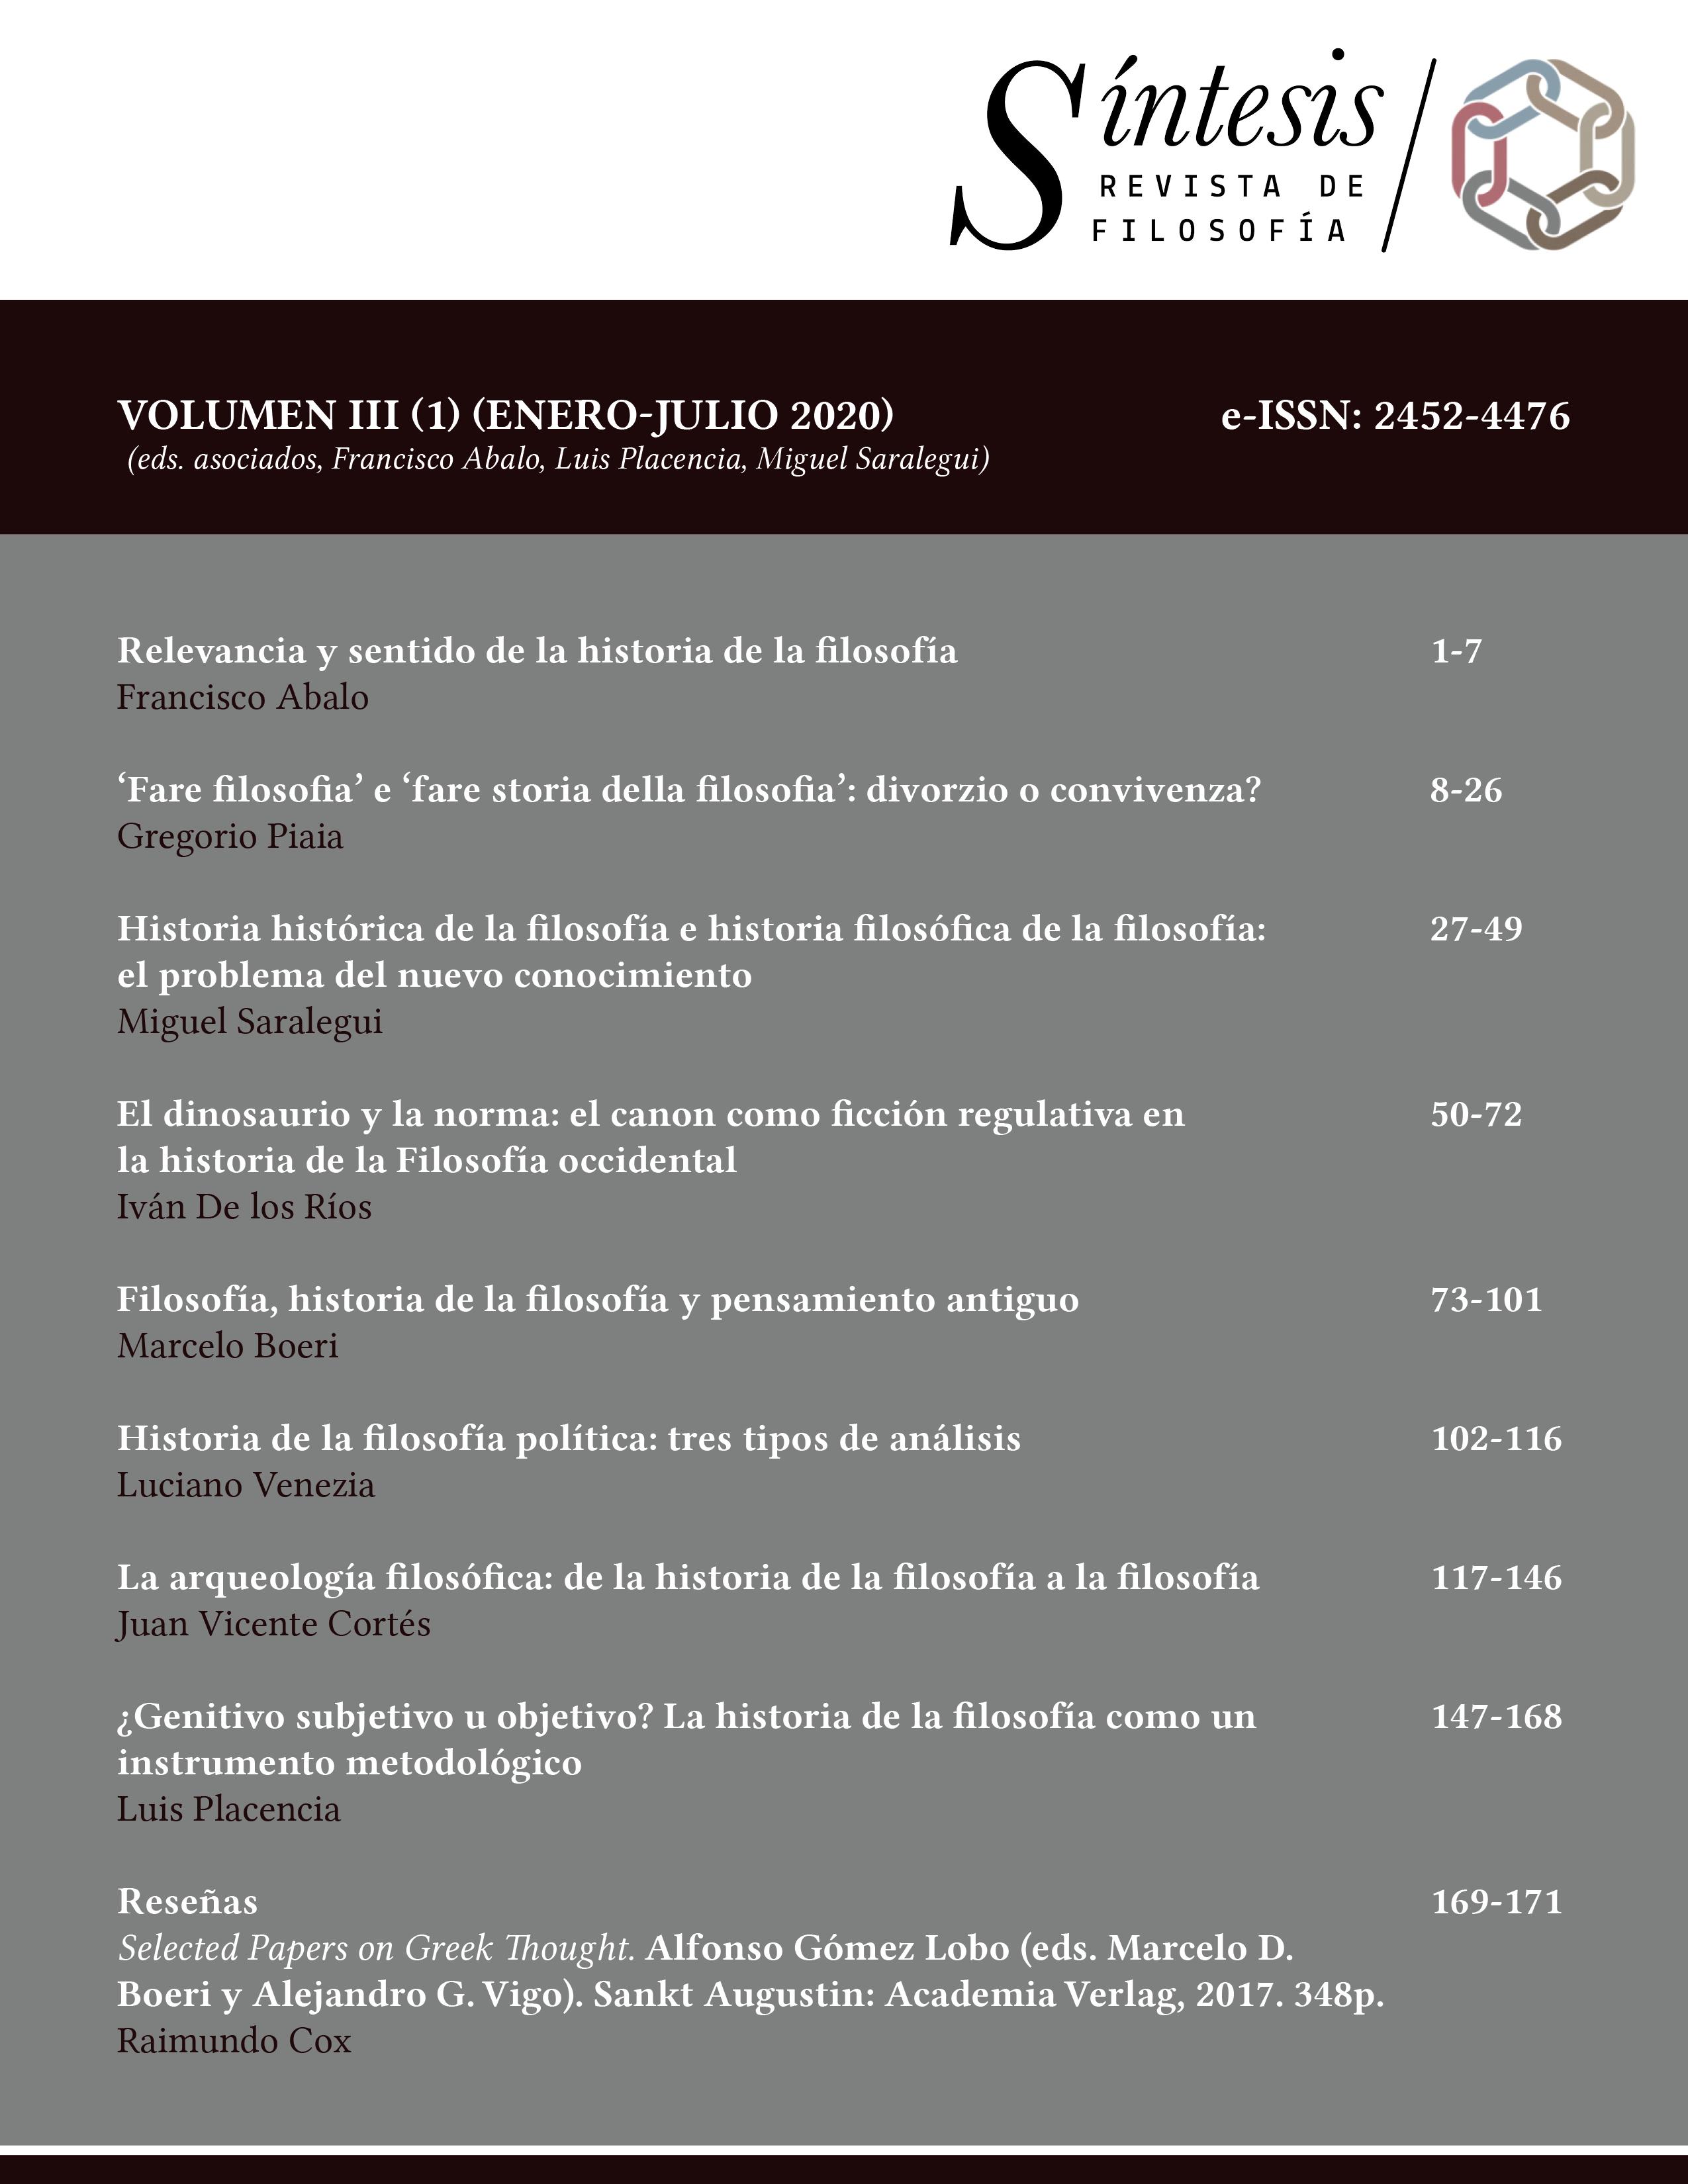 Fiosofía e historia de la filosofía